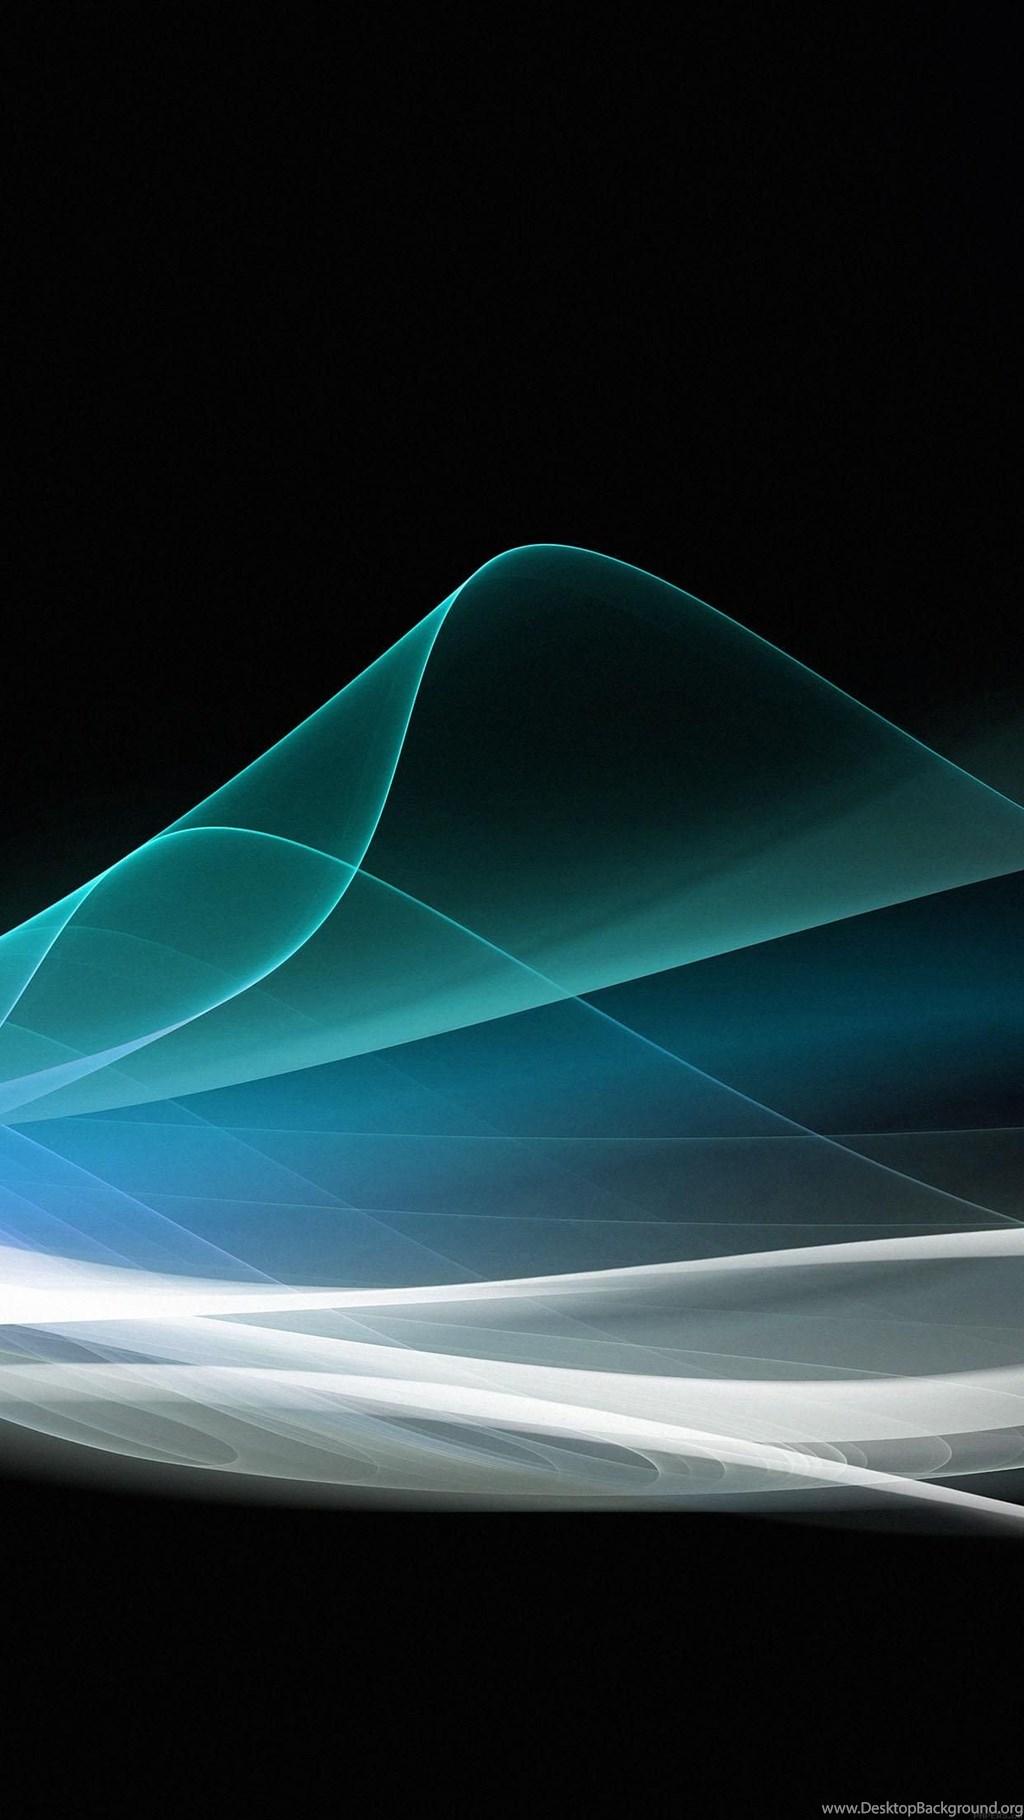 Wallpapers Energy Flow Dark Pattern Iphone 6s Plus - Dark Iphone 6s Hd - HD Wallpaper